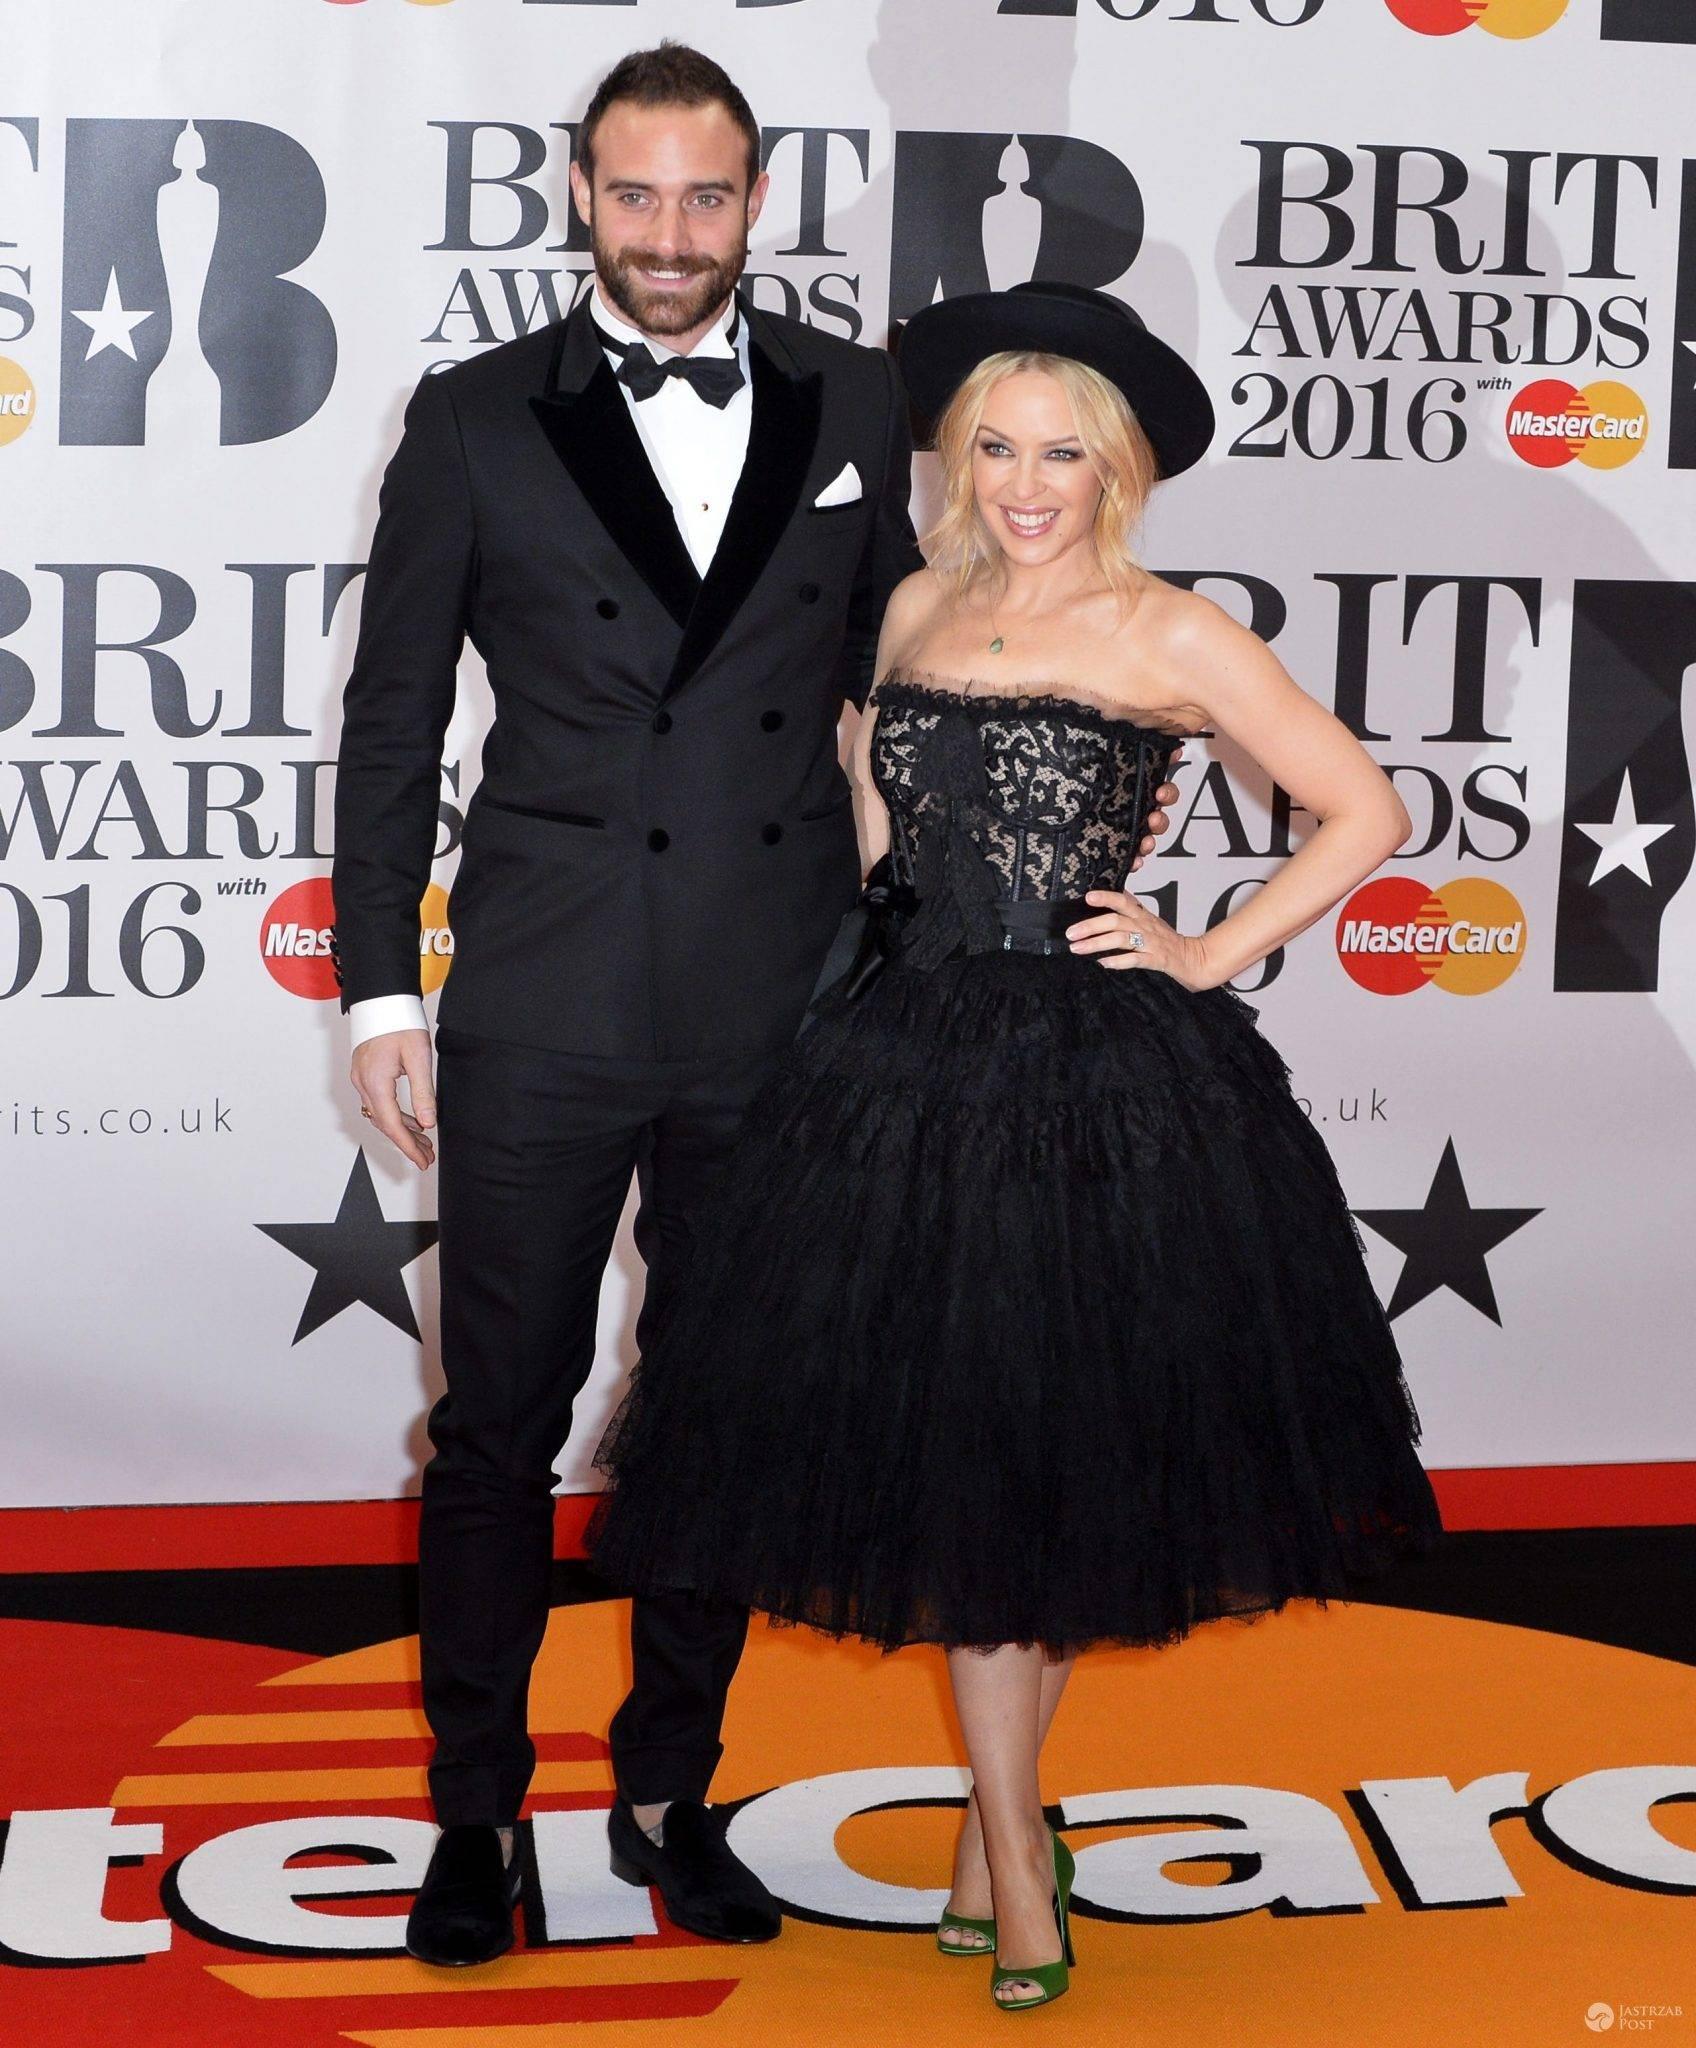 Joshua Sasse i Kylie Minogue (w sukience Dolce & Gabbana), BRIT Awards 2016 (fot. ONS)